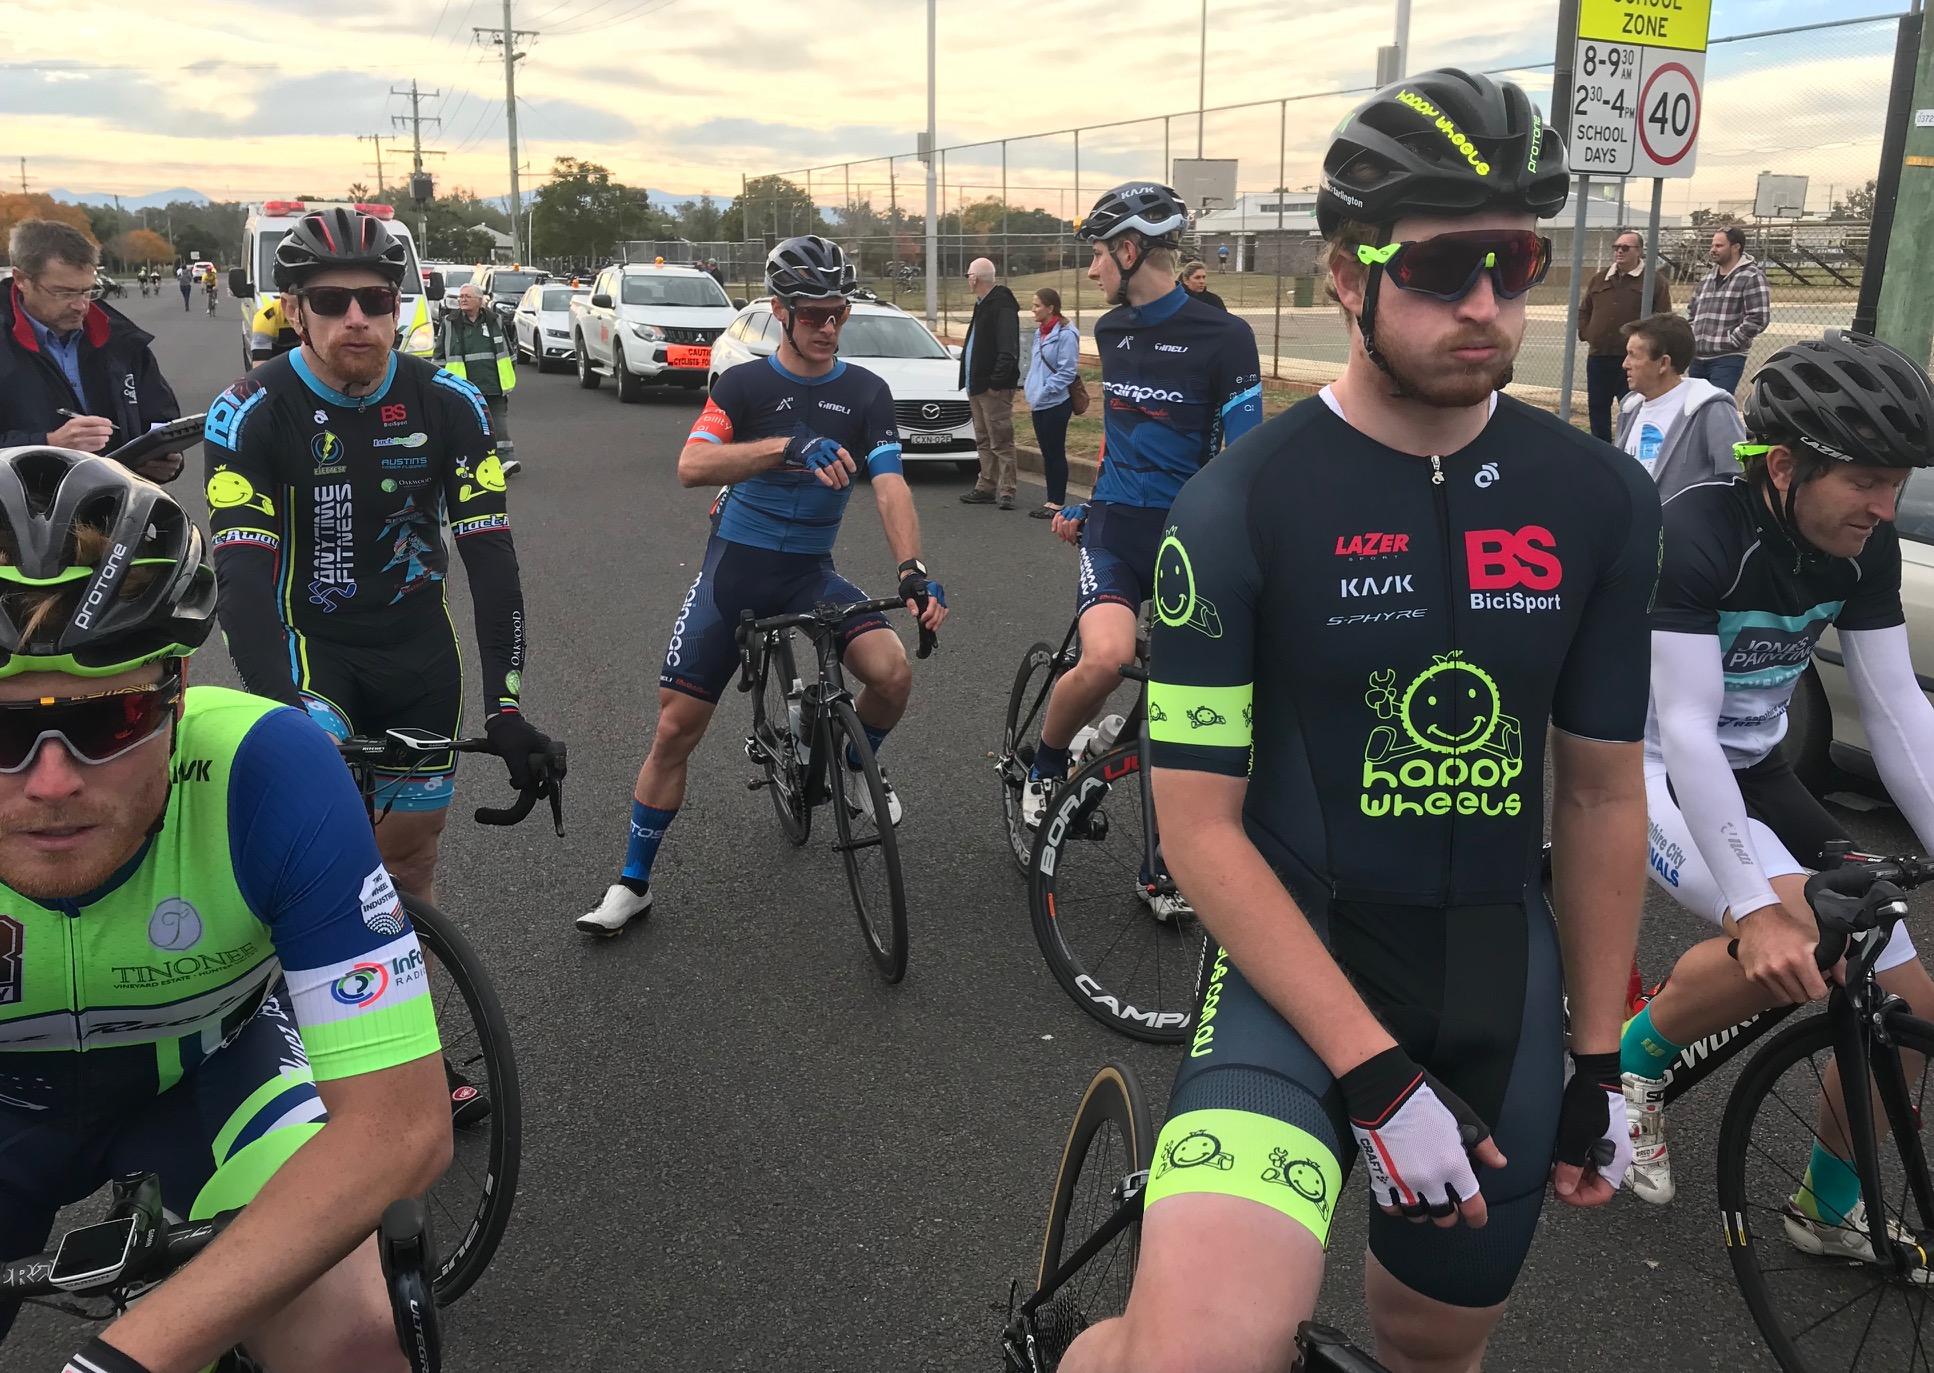 Gunnedah Tamworth Road Race @ 16 June - Division 2 start line with Rhett Hall & Conor Tarlington